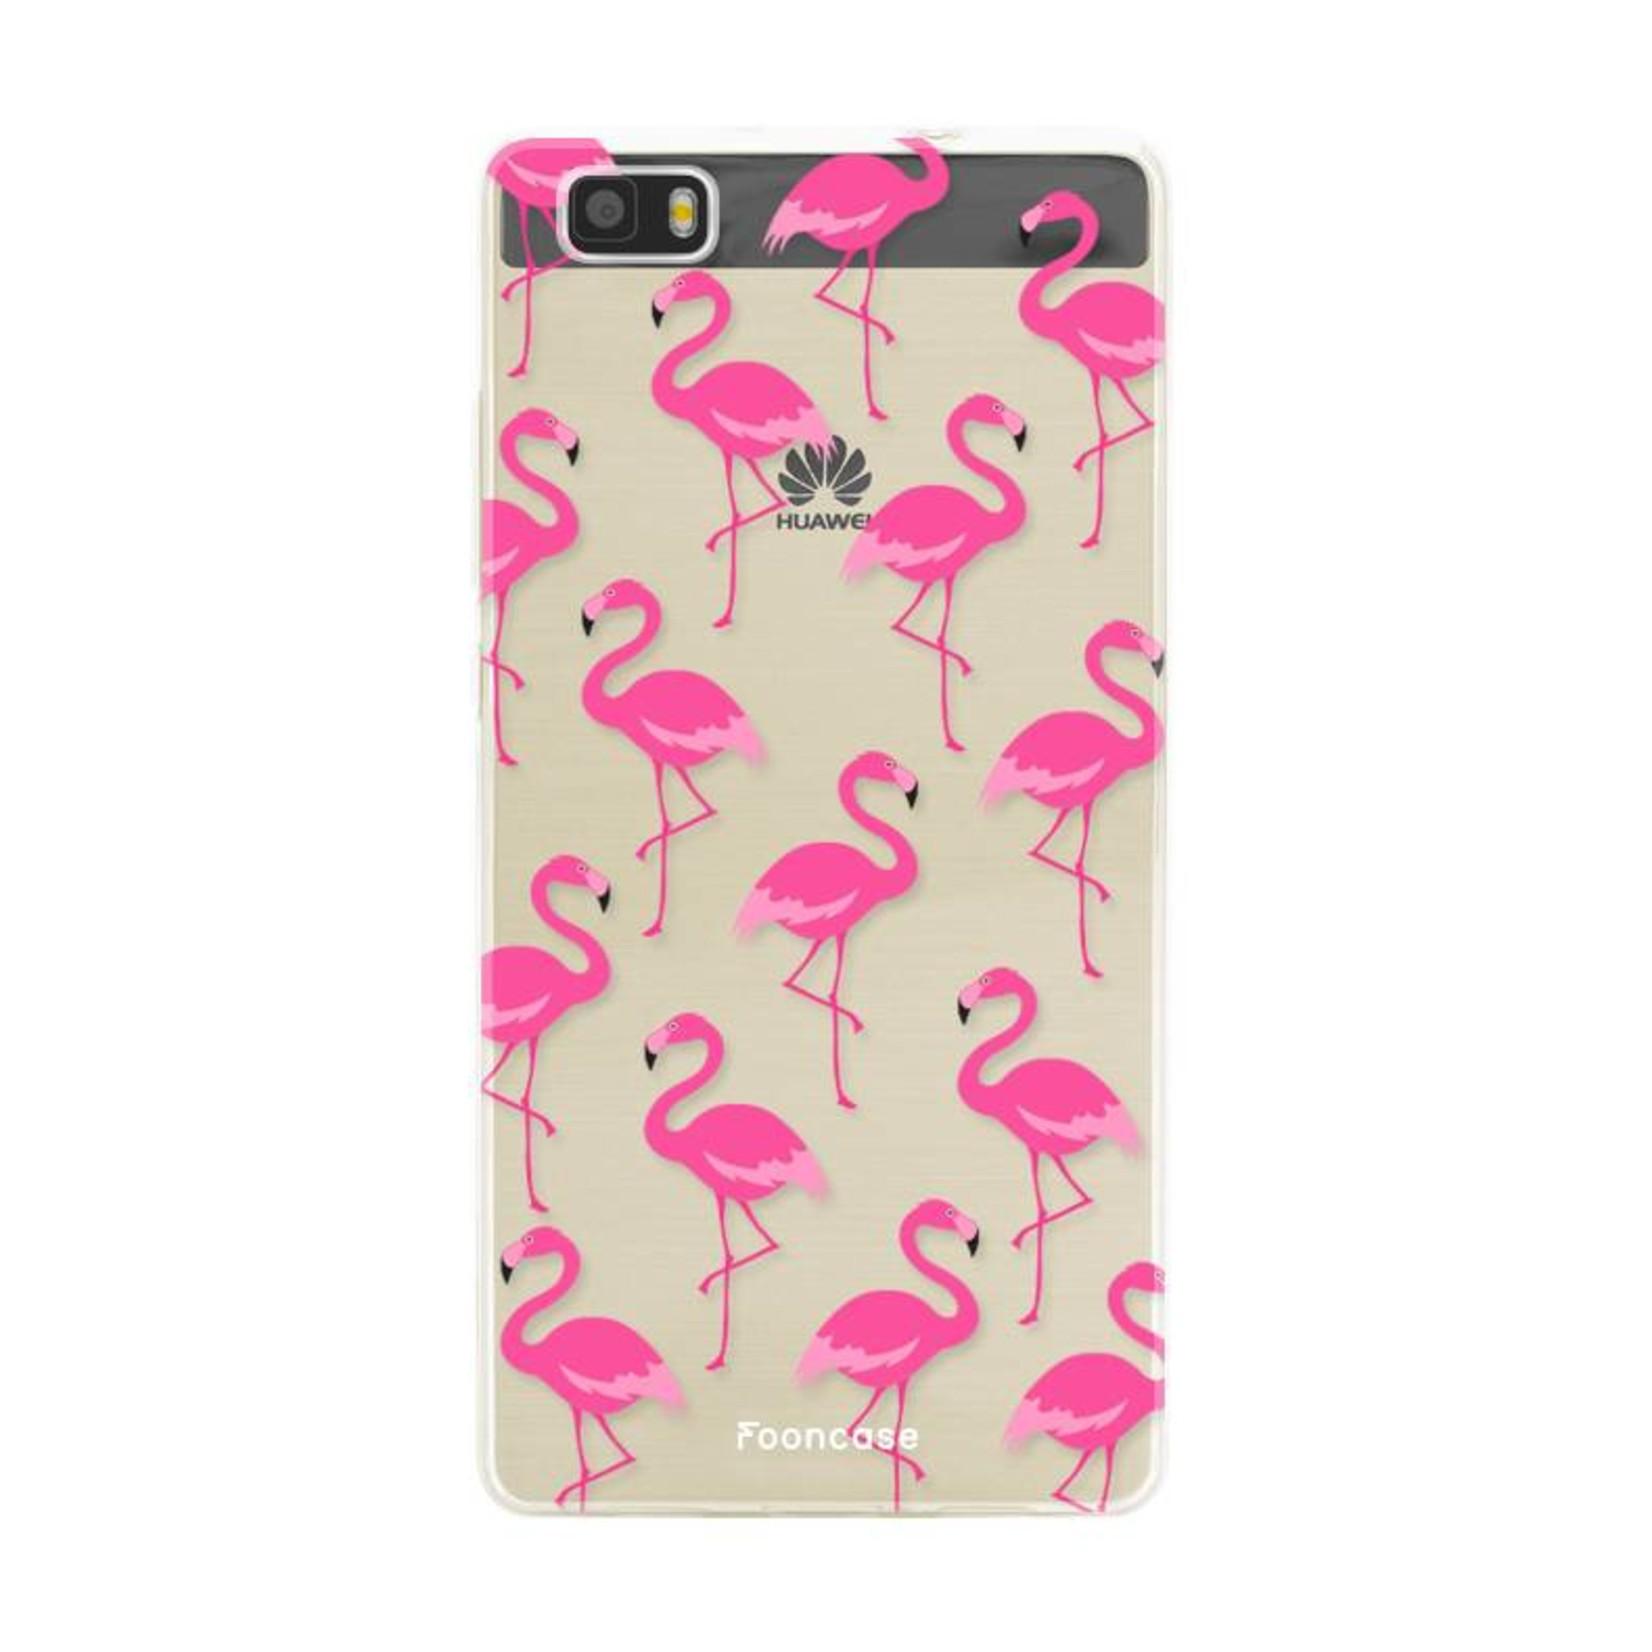 FOONCASE Huawei P8 Lite 2016 hoesje TPU Soft Case - Back Cover - Flamingo